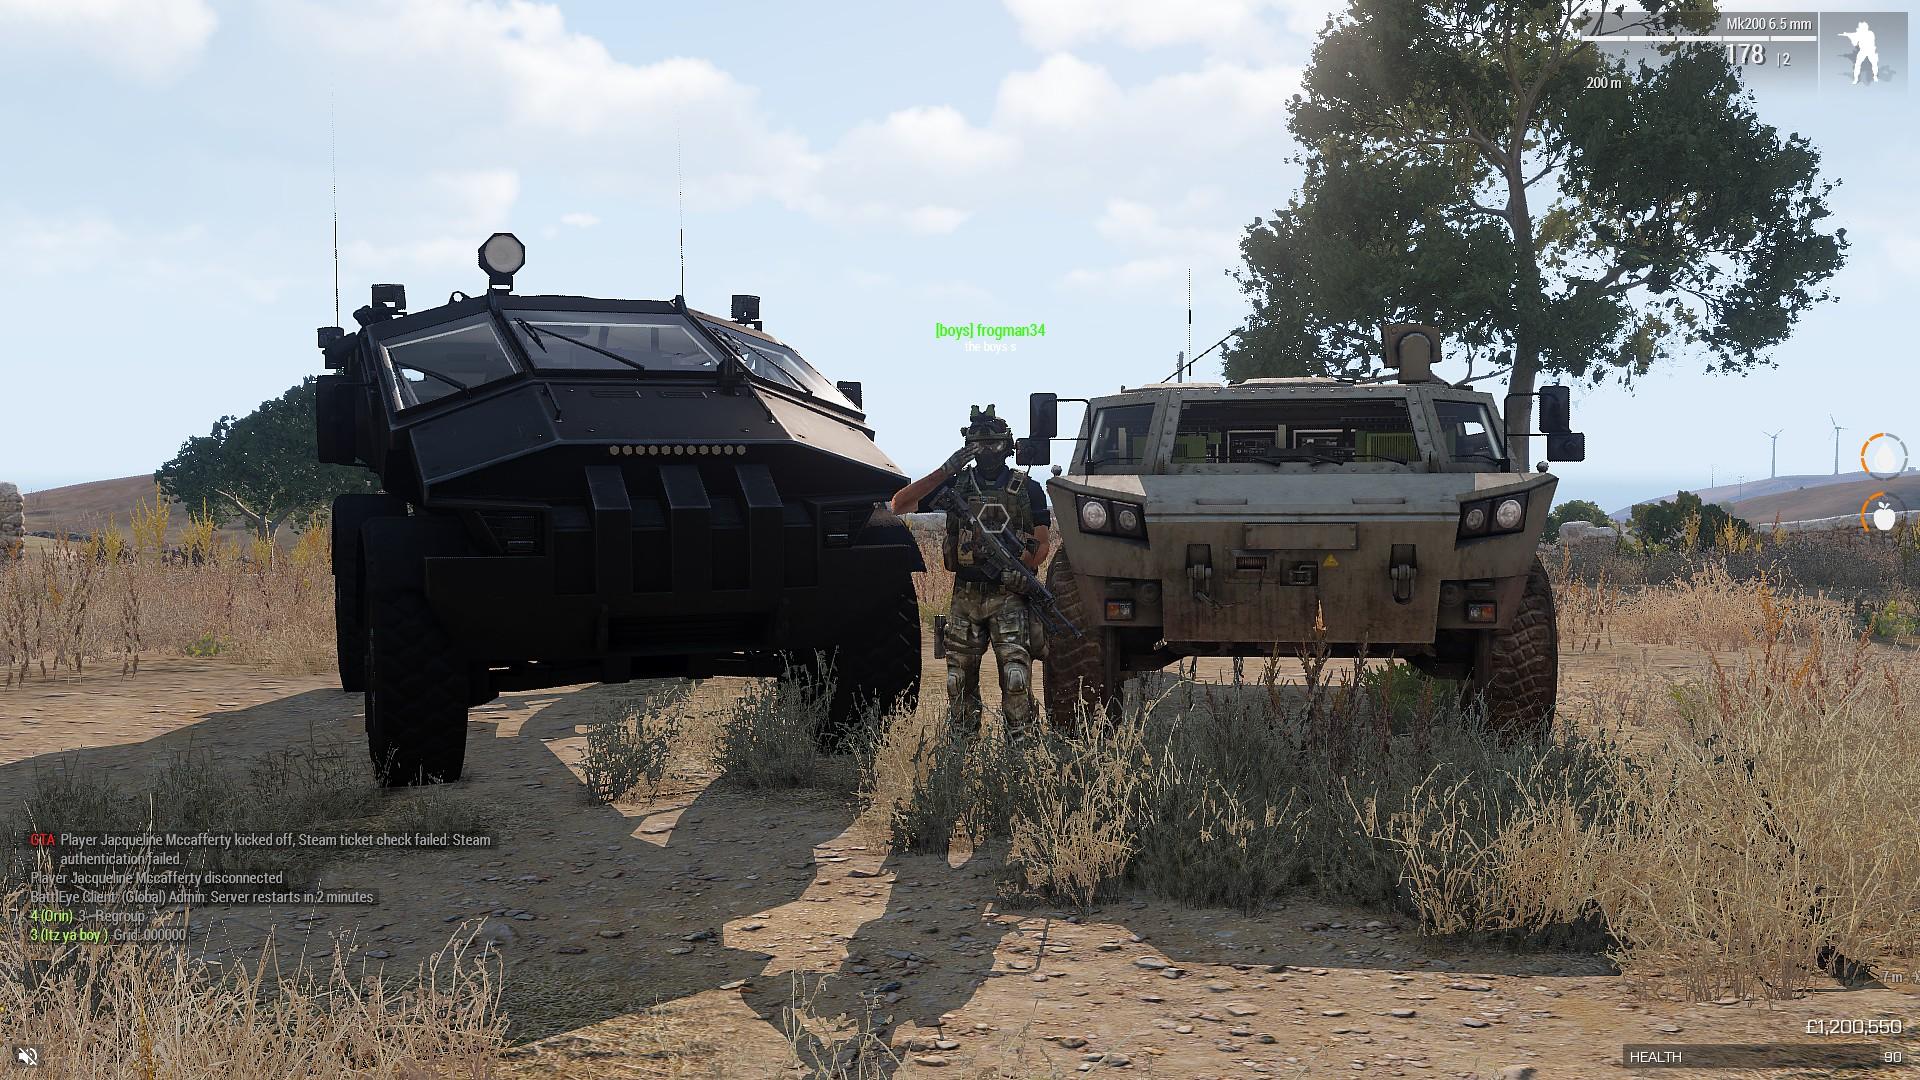 Markusmoon - Grand Theft ArmA - The Altis Life Community